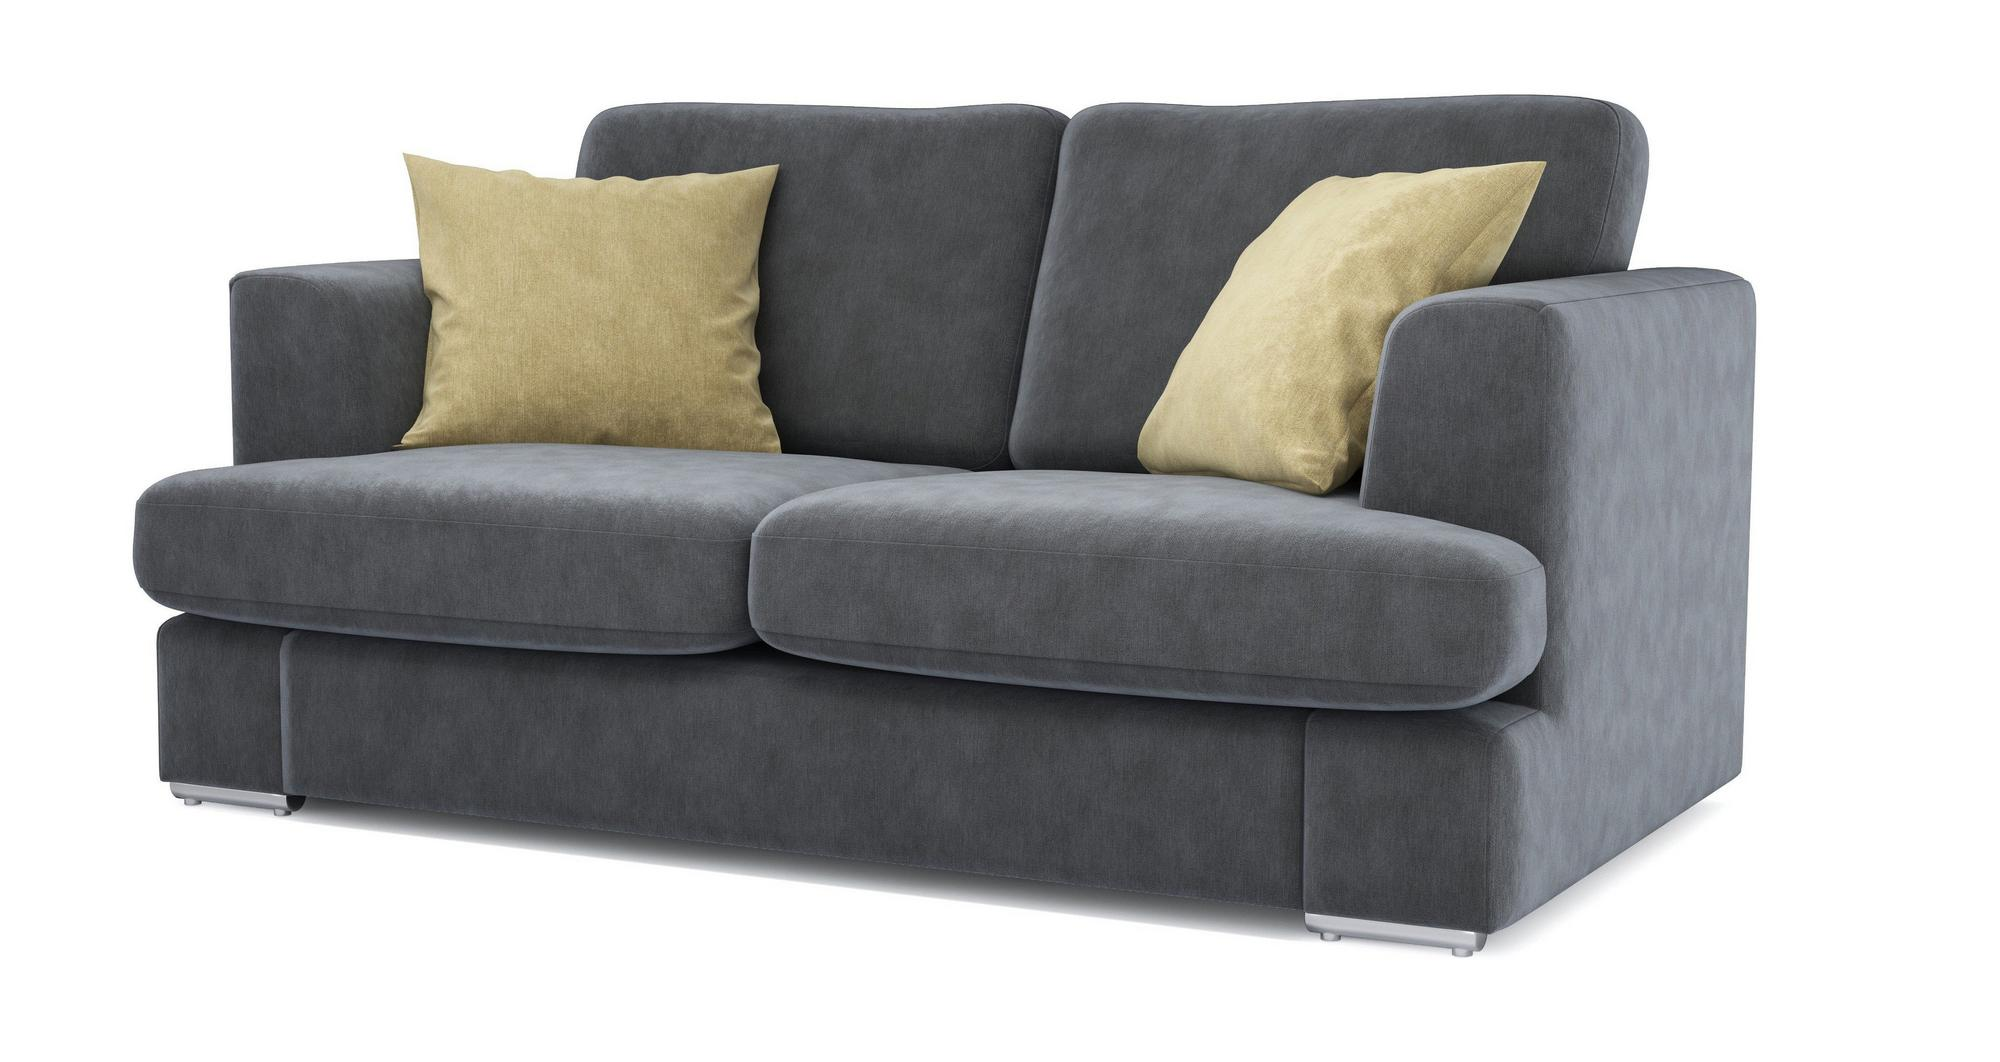 Dfs Freya Graphite Grey Fabric 2 Seater Sofa